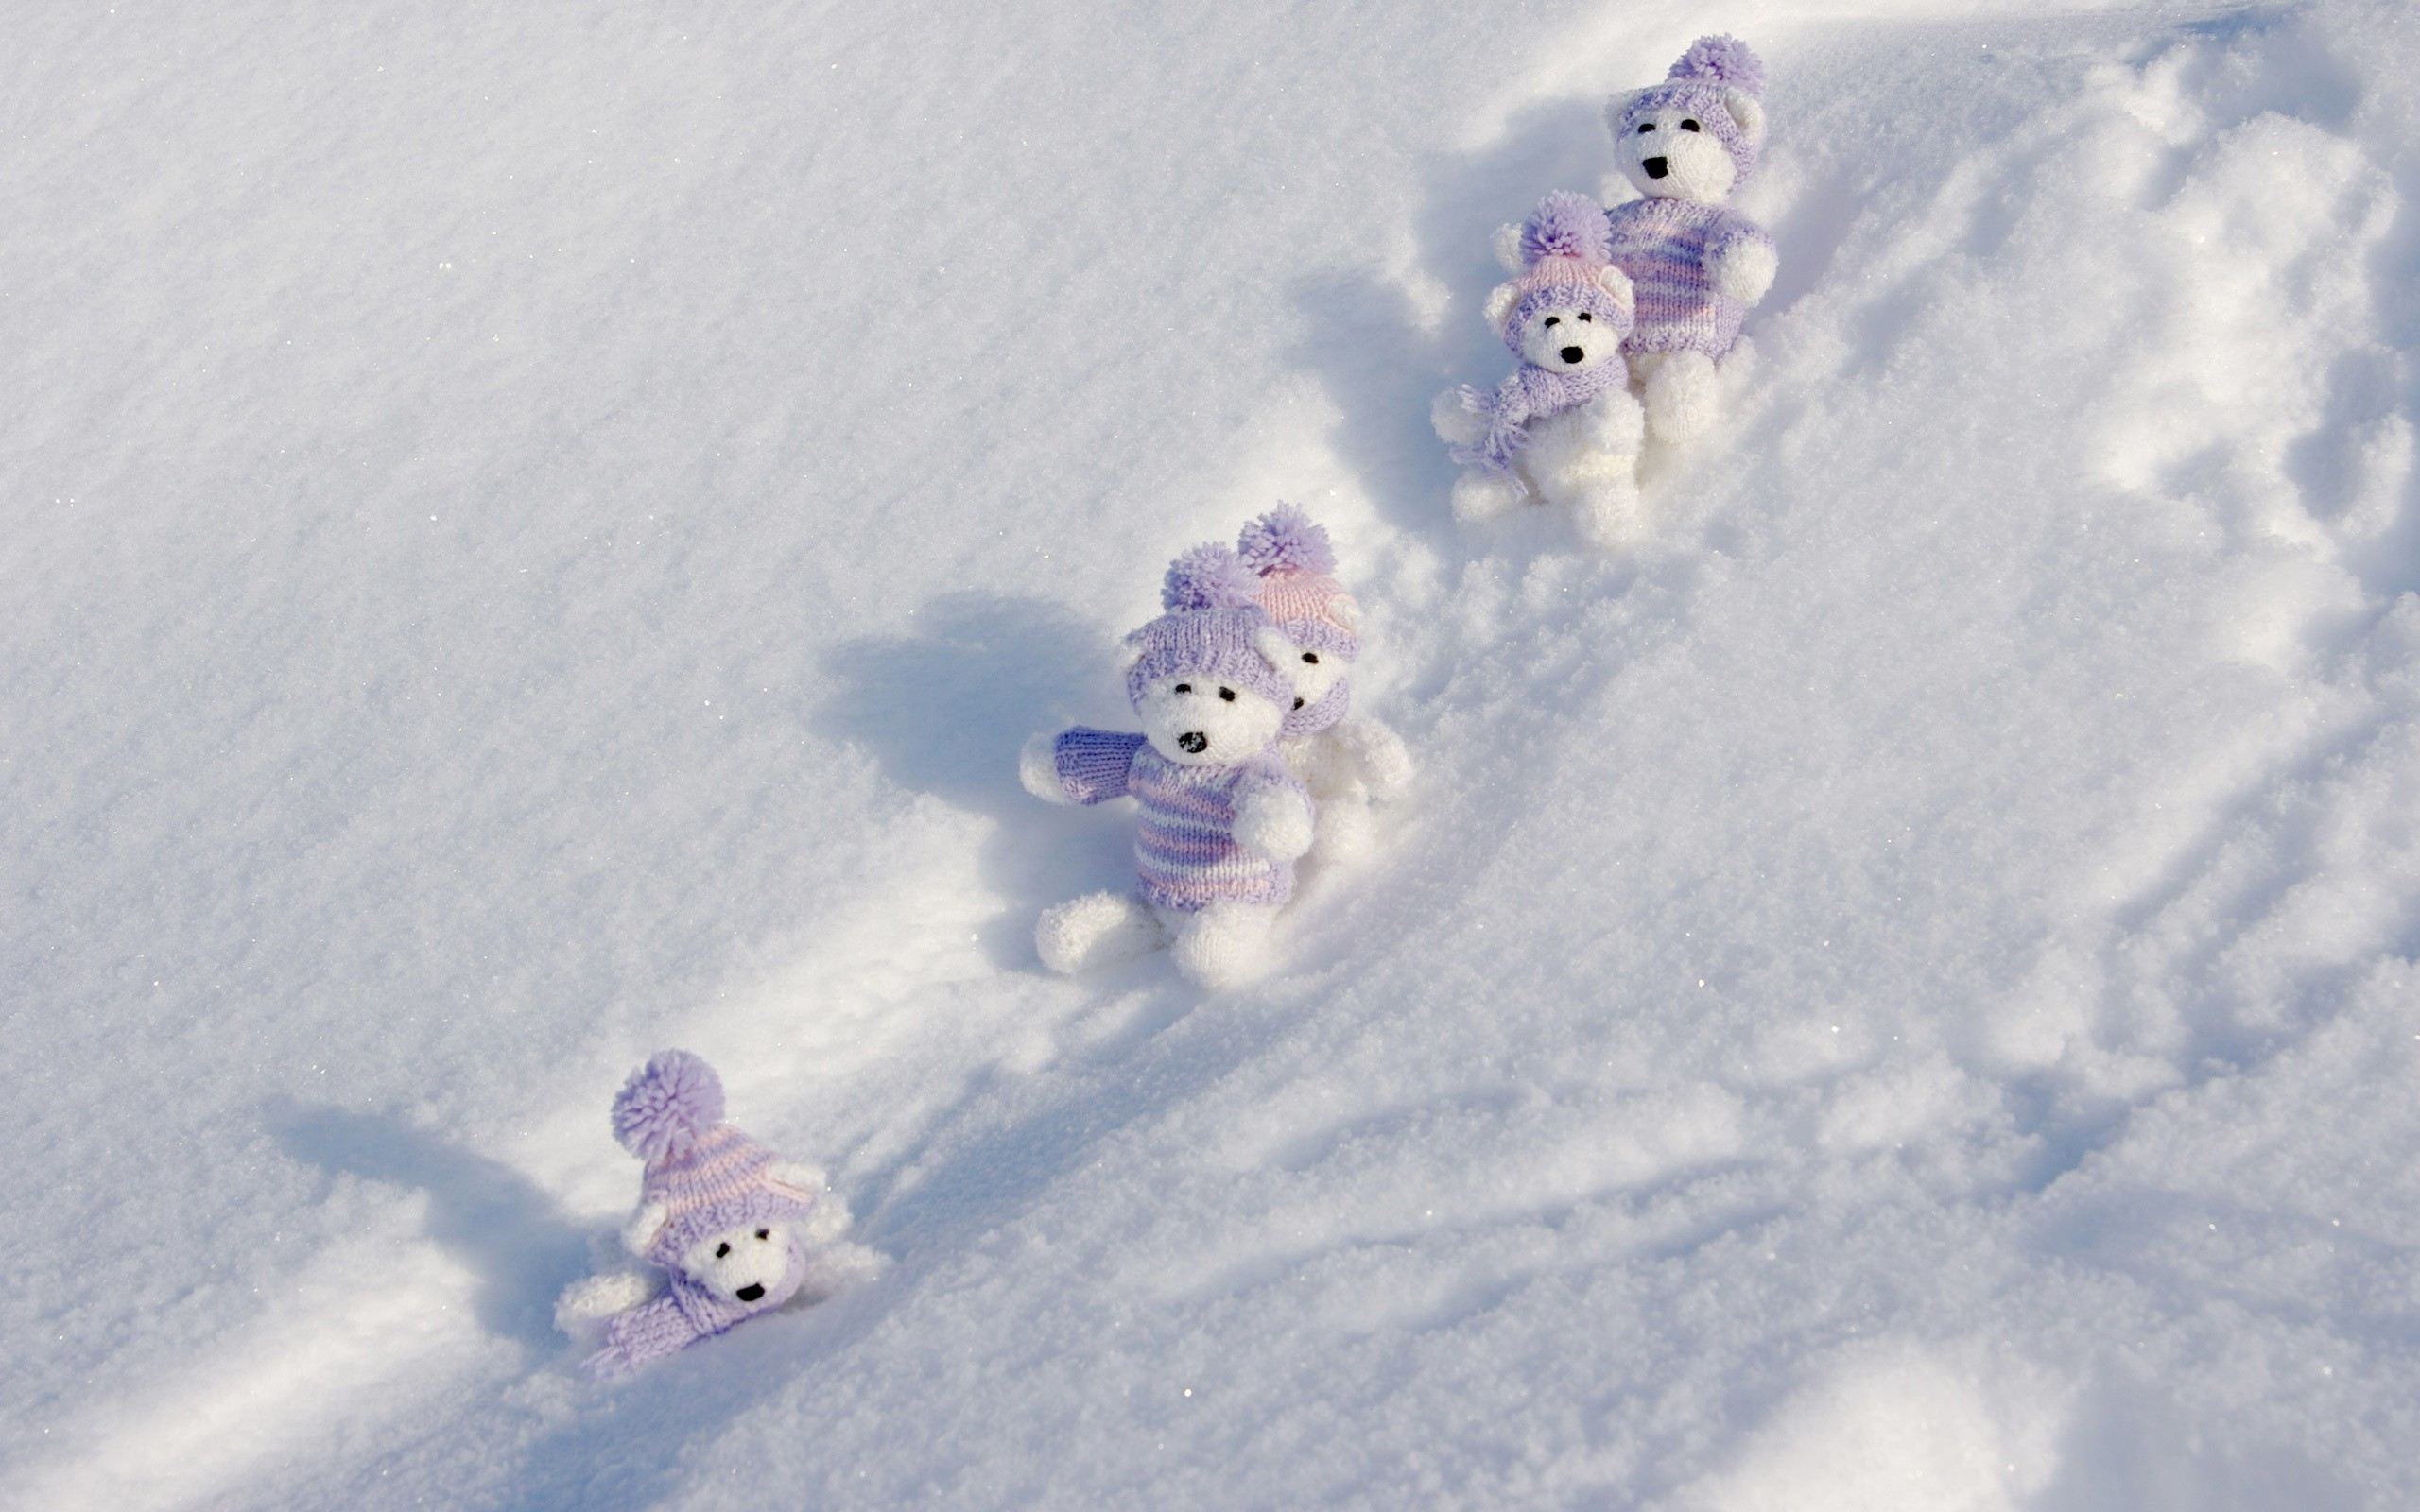 Winter Teddy Bears wallpapers | Winter Teddy Bears stock photos